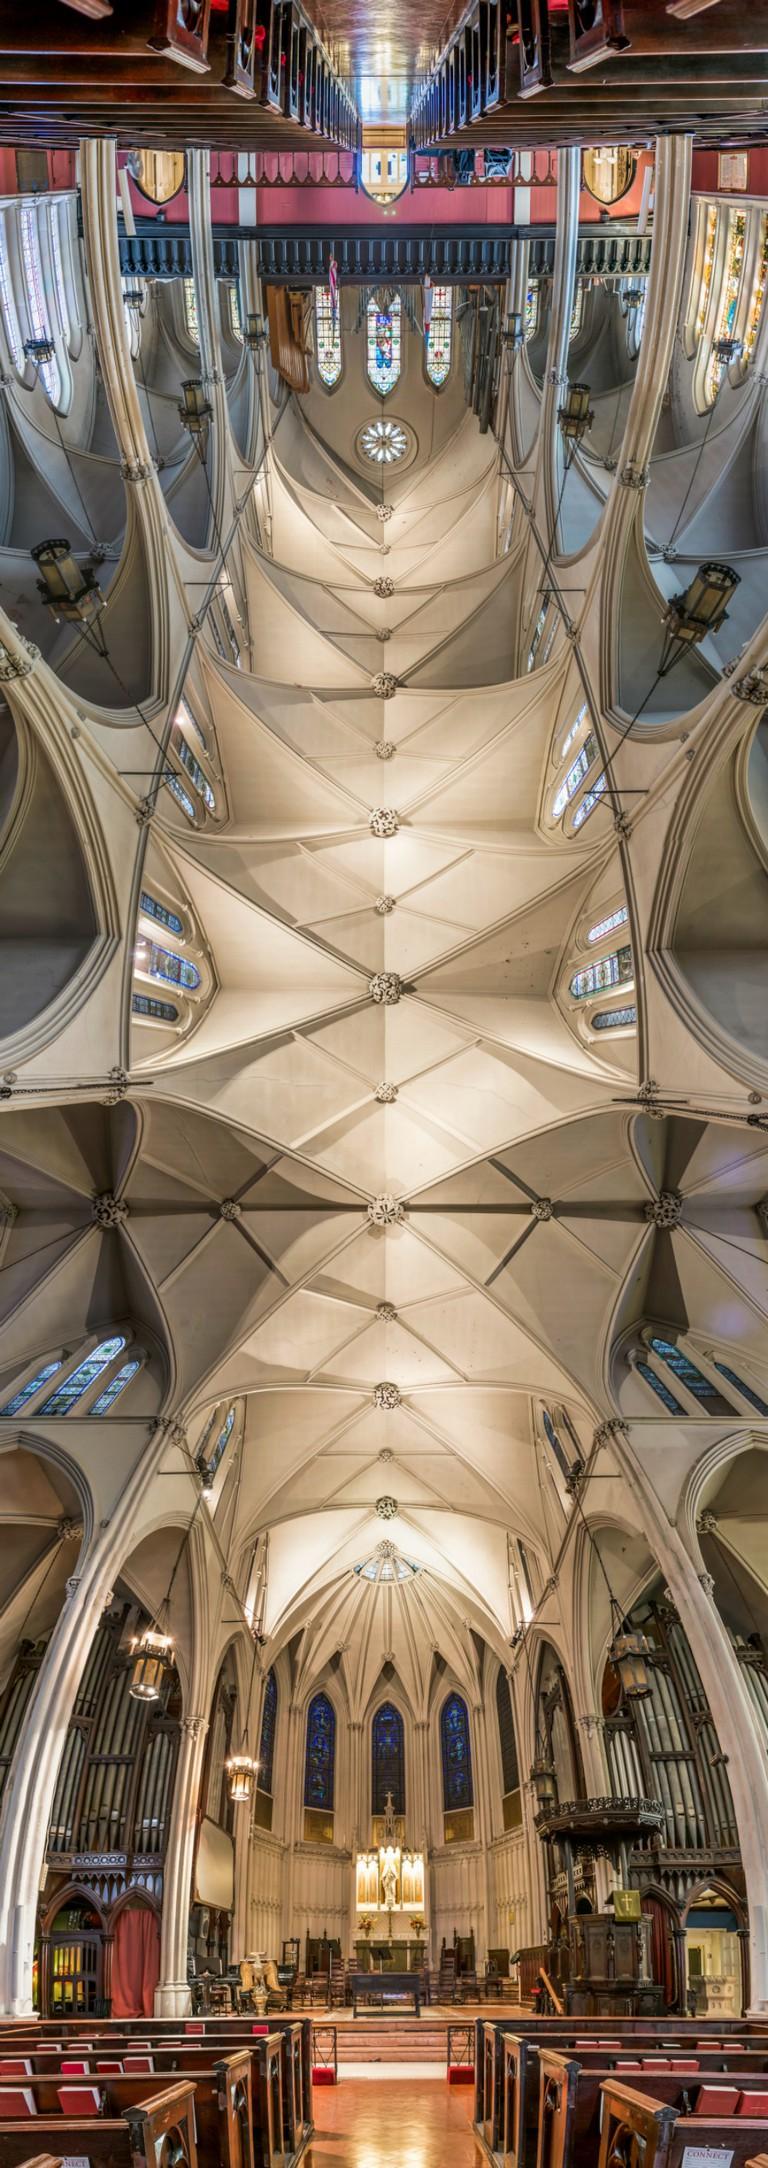 Calvary-St. George Episcopal Church © Richard Silver